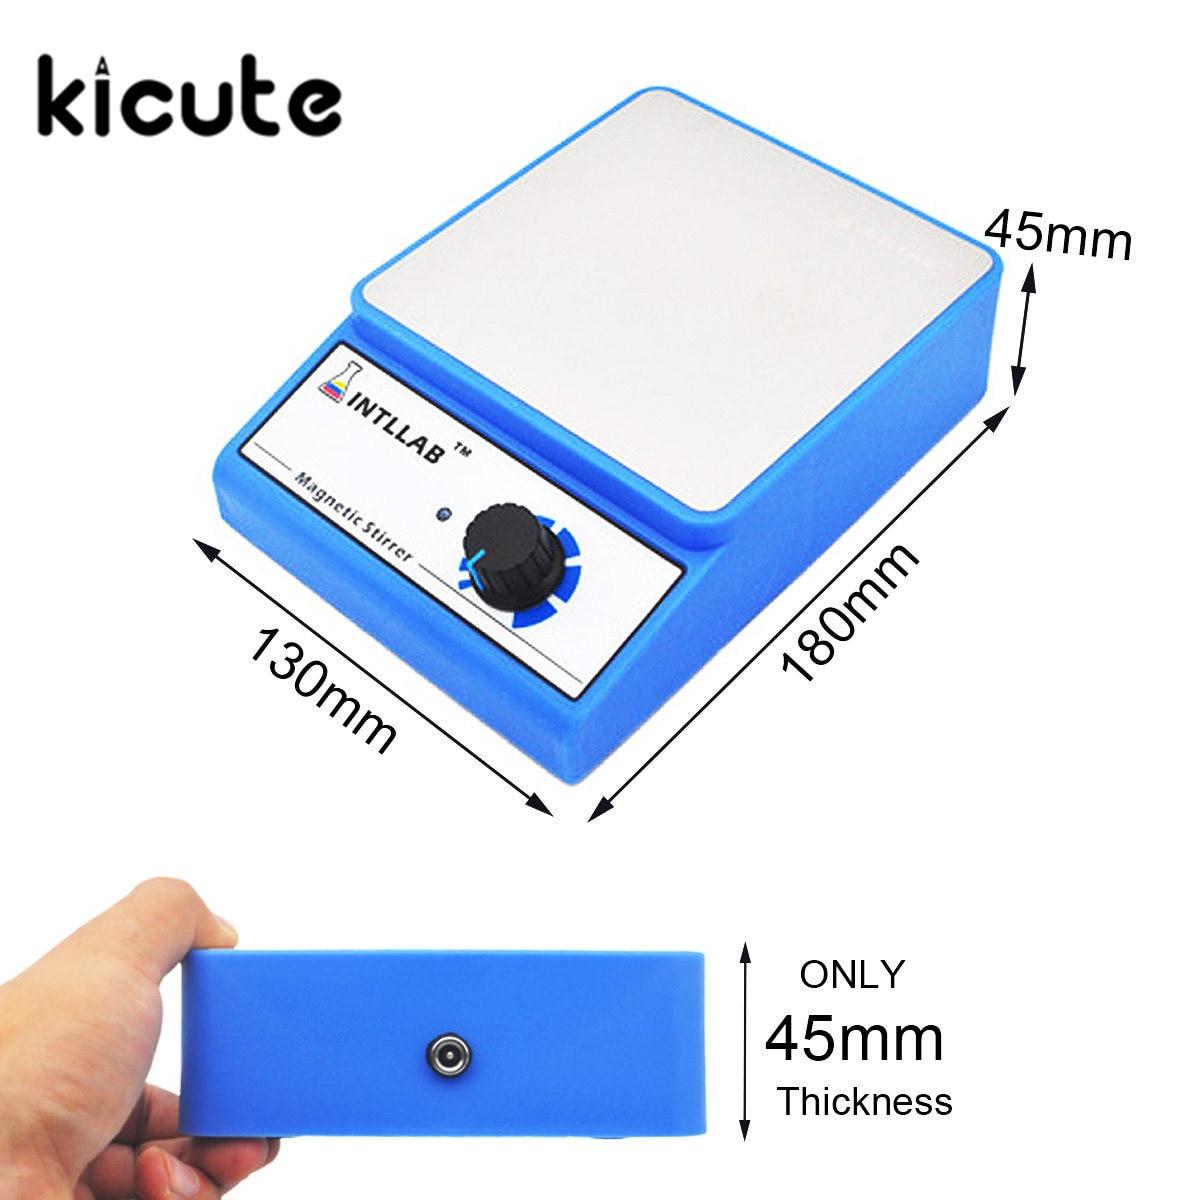 KiCute New Magnetic Stirrer Home Laboratory Magnetic Mixer Stirrers Apparatus AC100-240V Laboratory Chemistry Magnetic Stirrer<br>